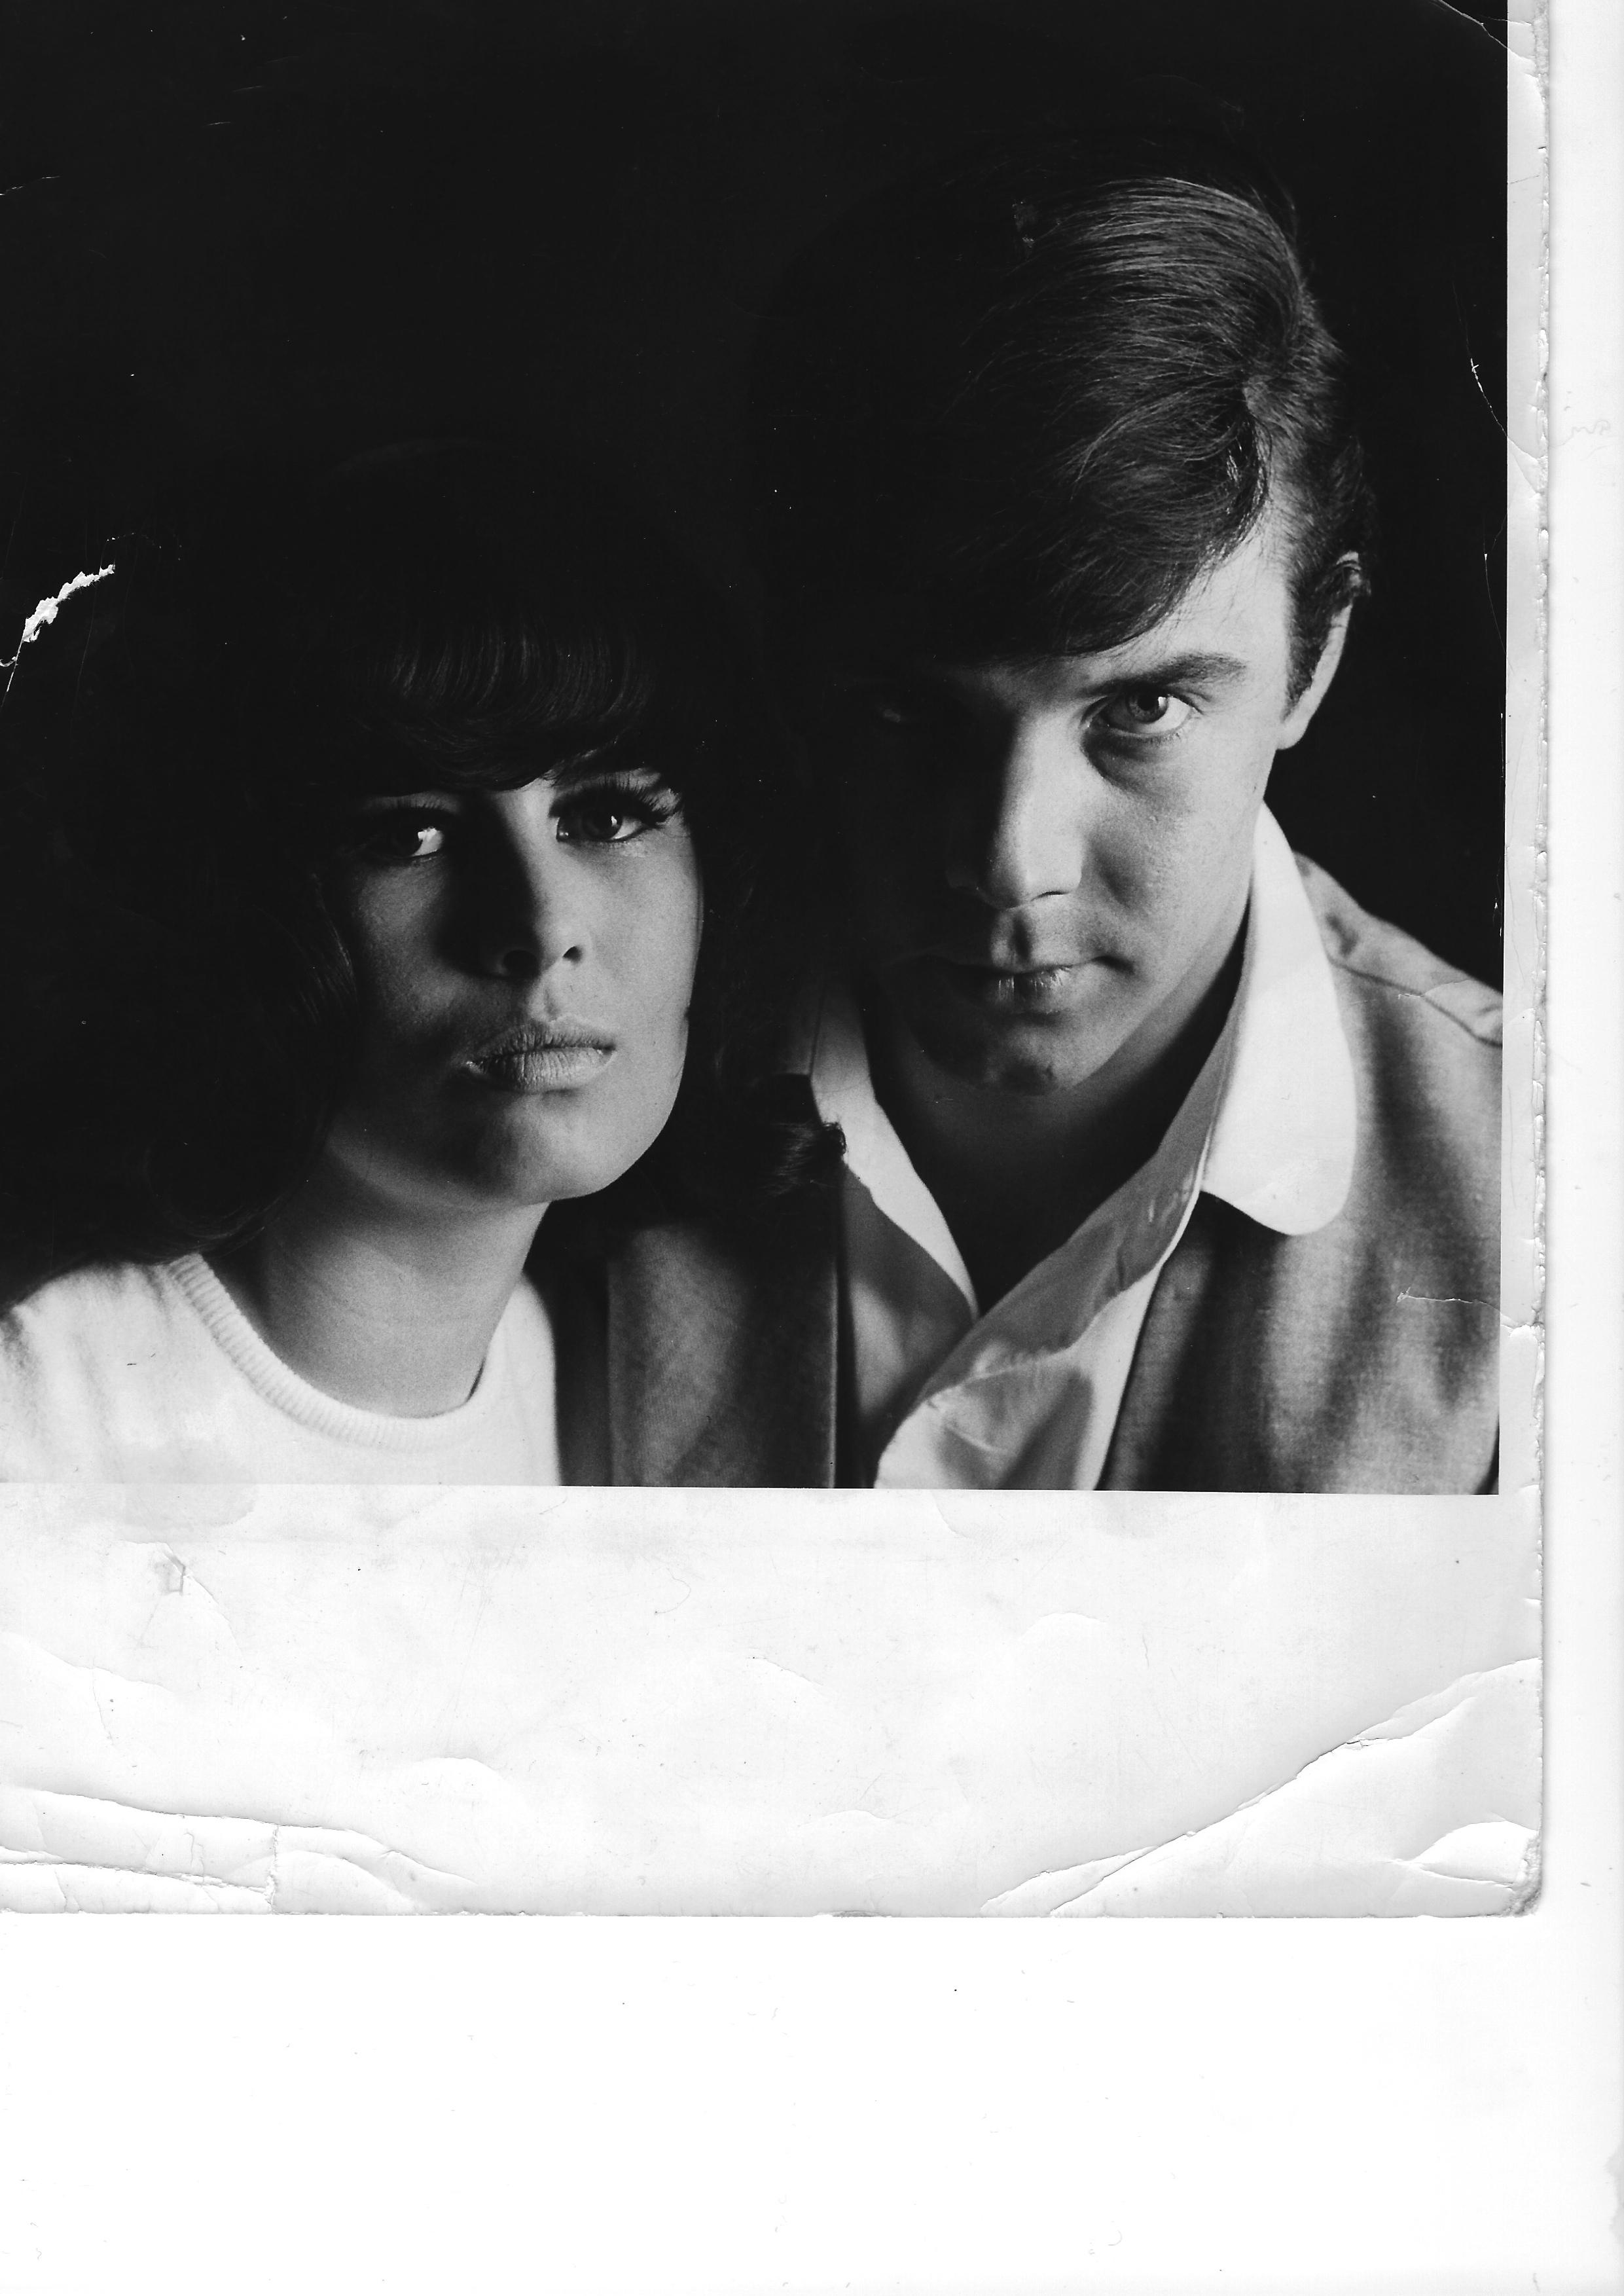 Marty & Joyce